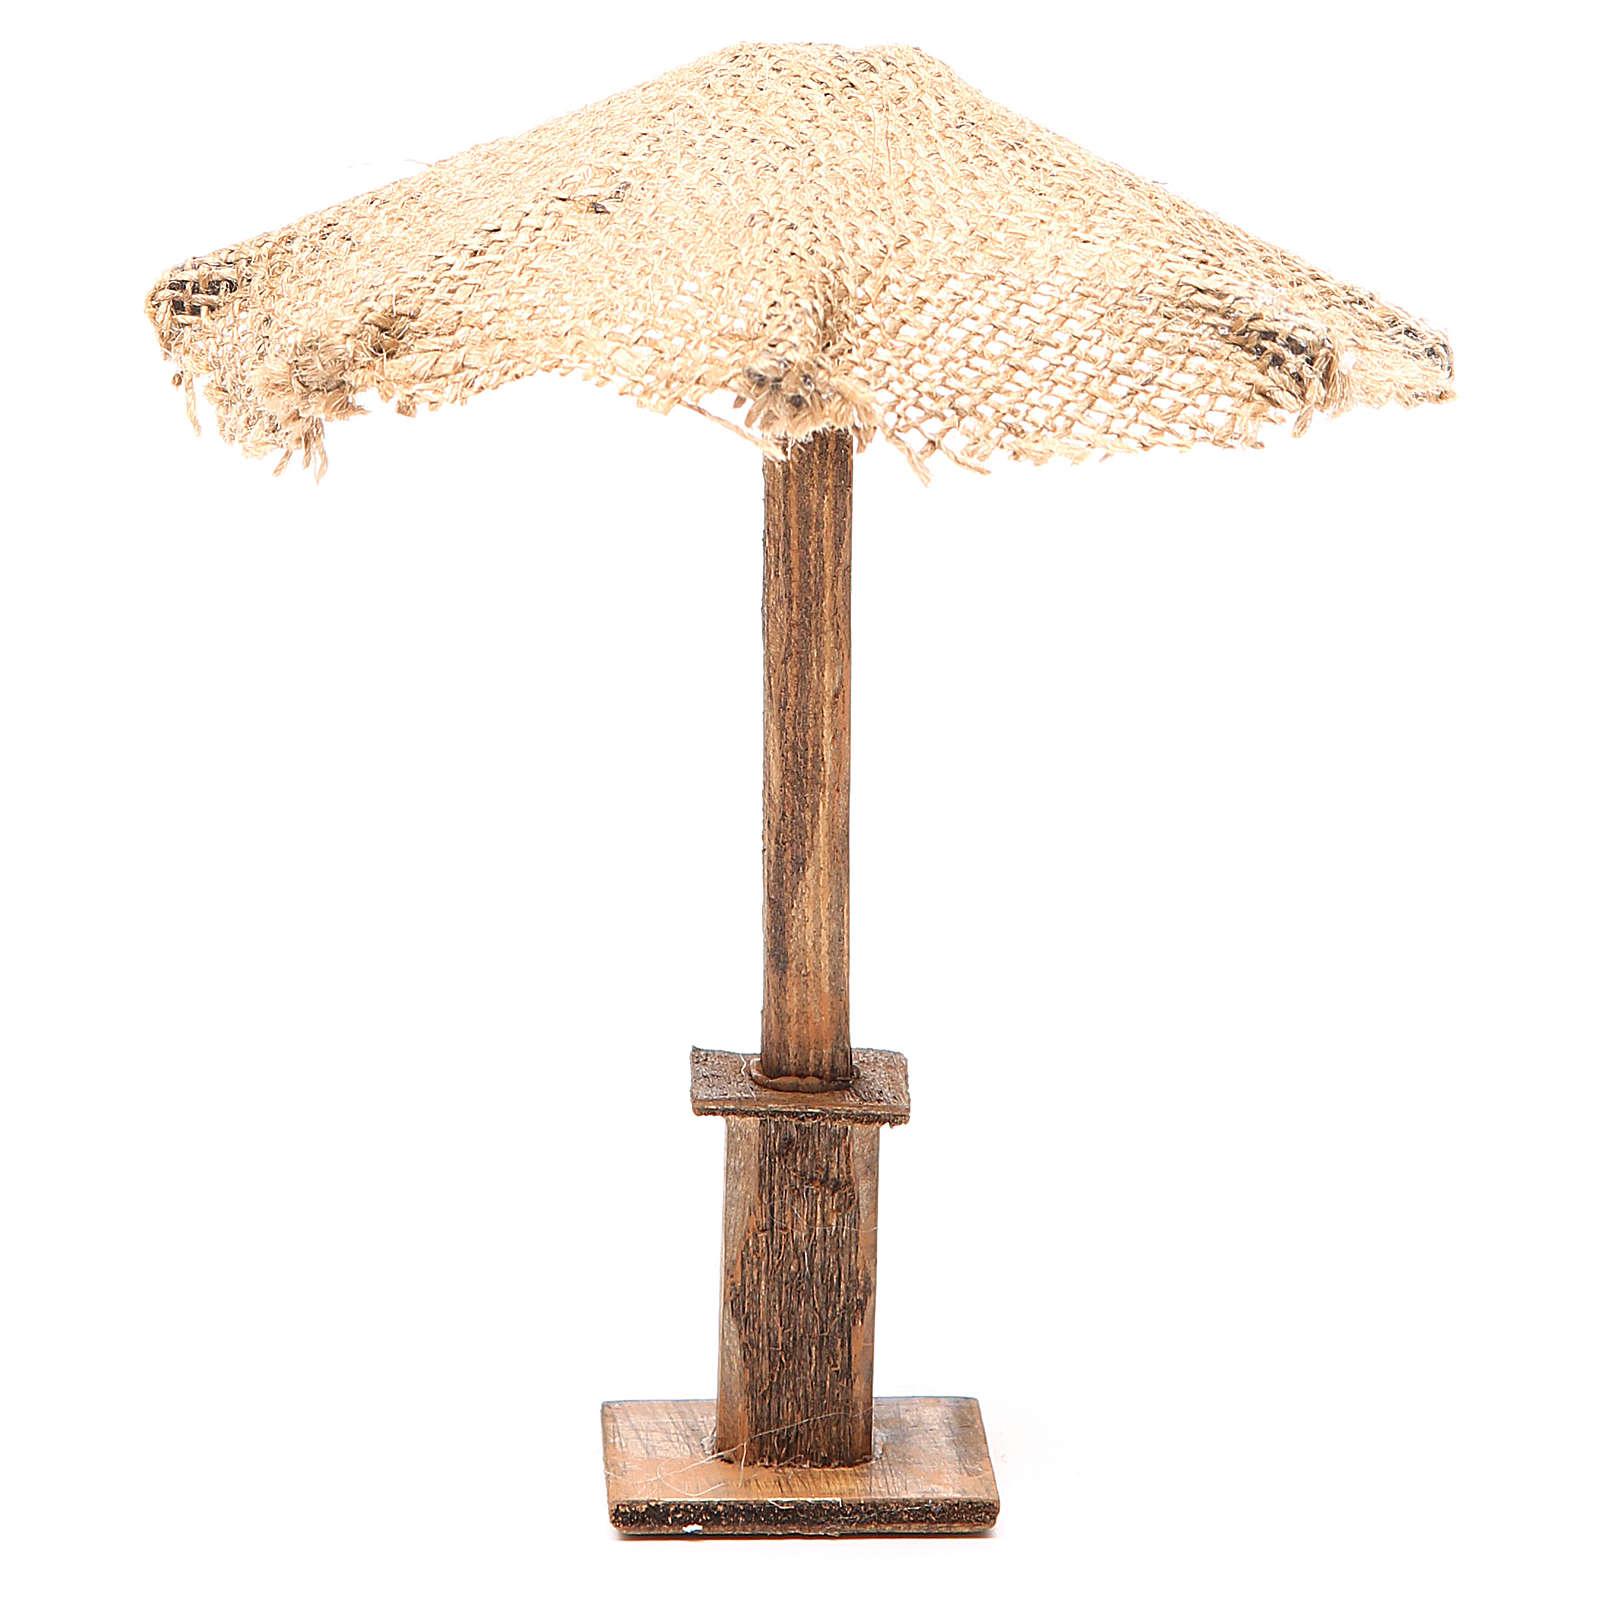 Guarda-chuva juta para presépio 16x16x16 cm 4